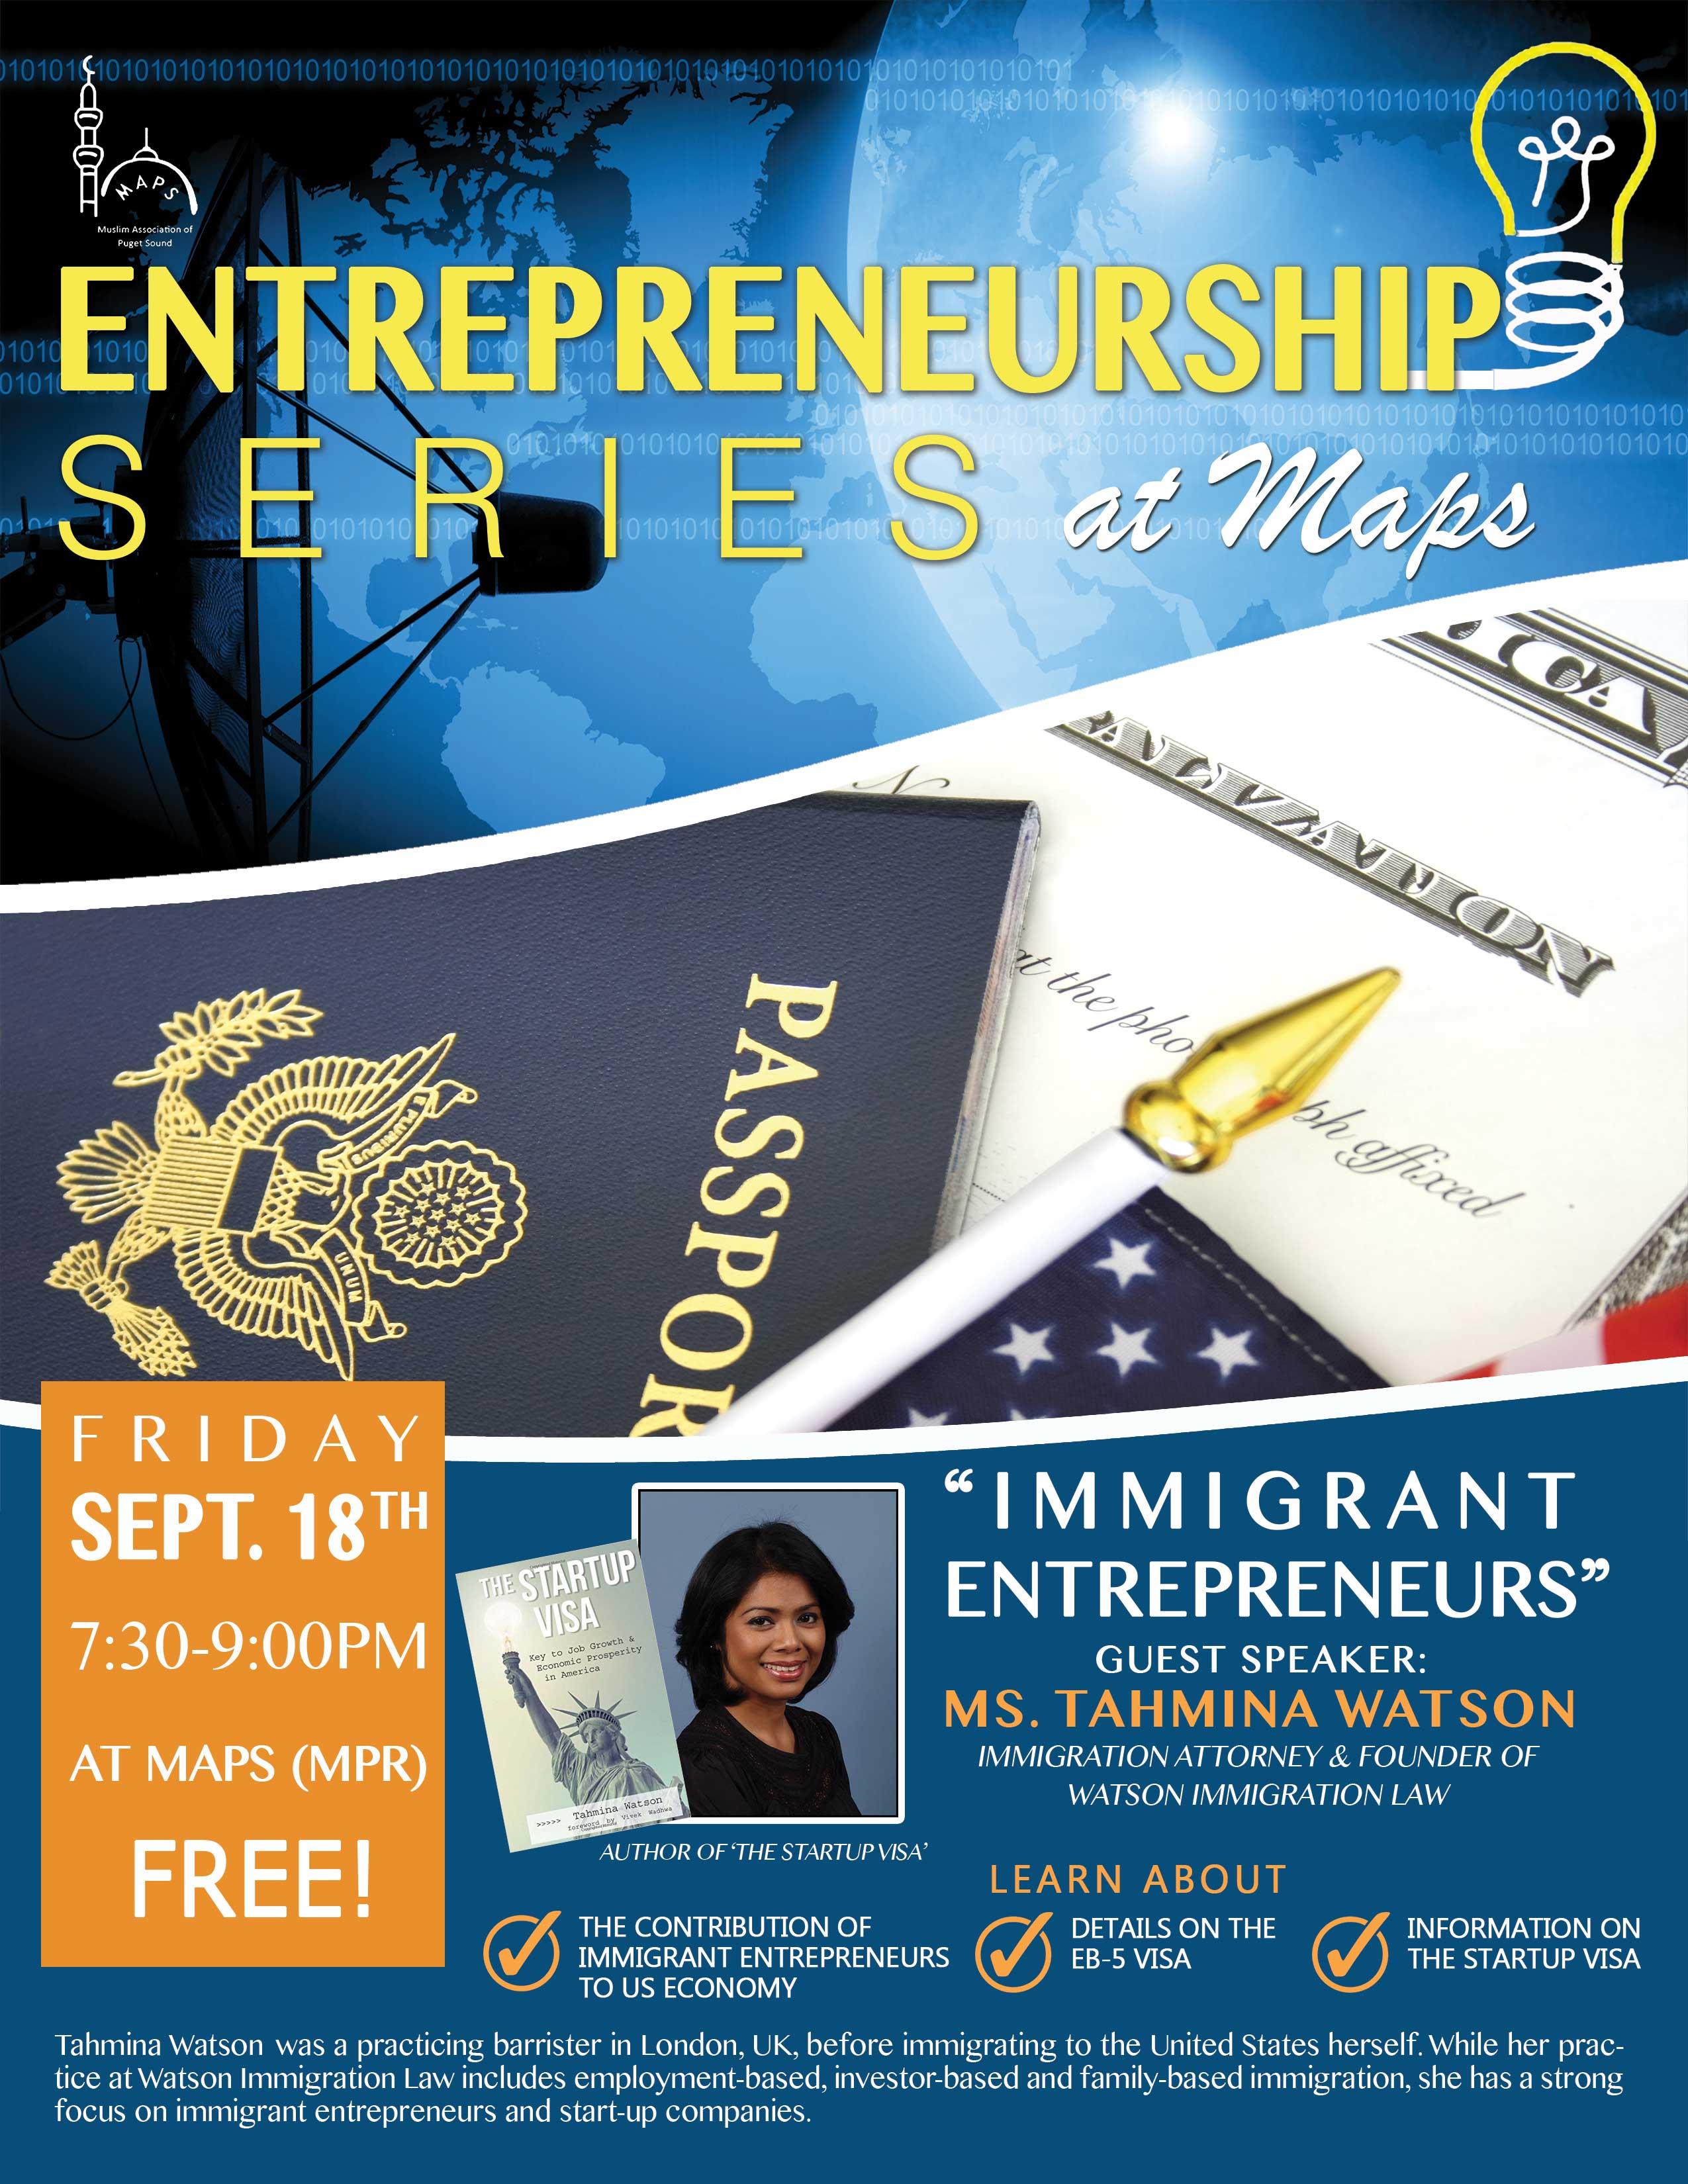 MAPS_entrepreneurshipSeries_flyer_web